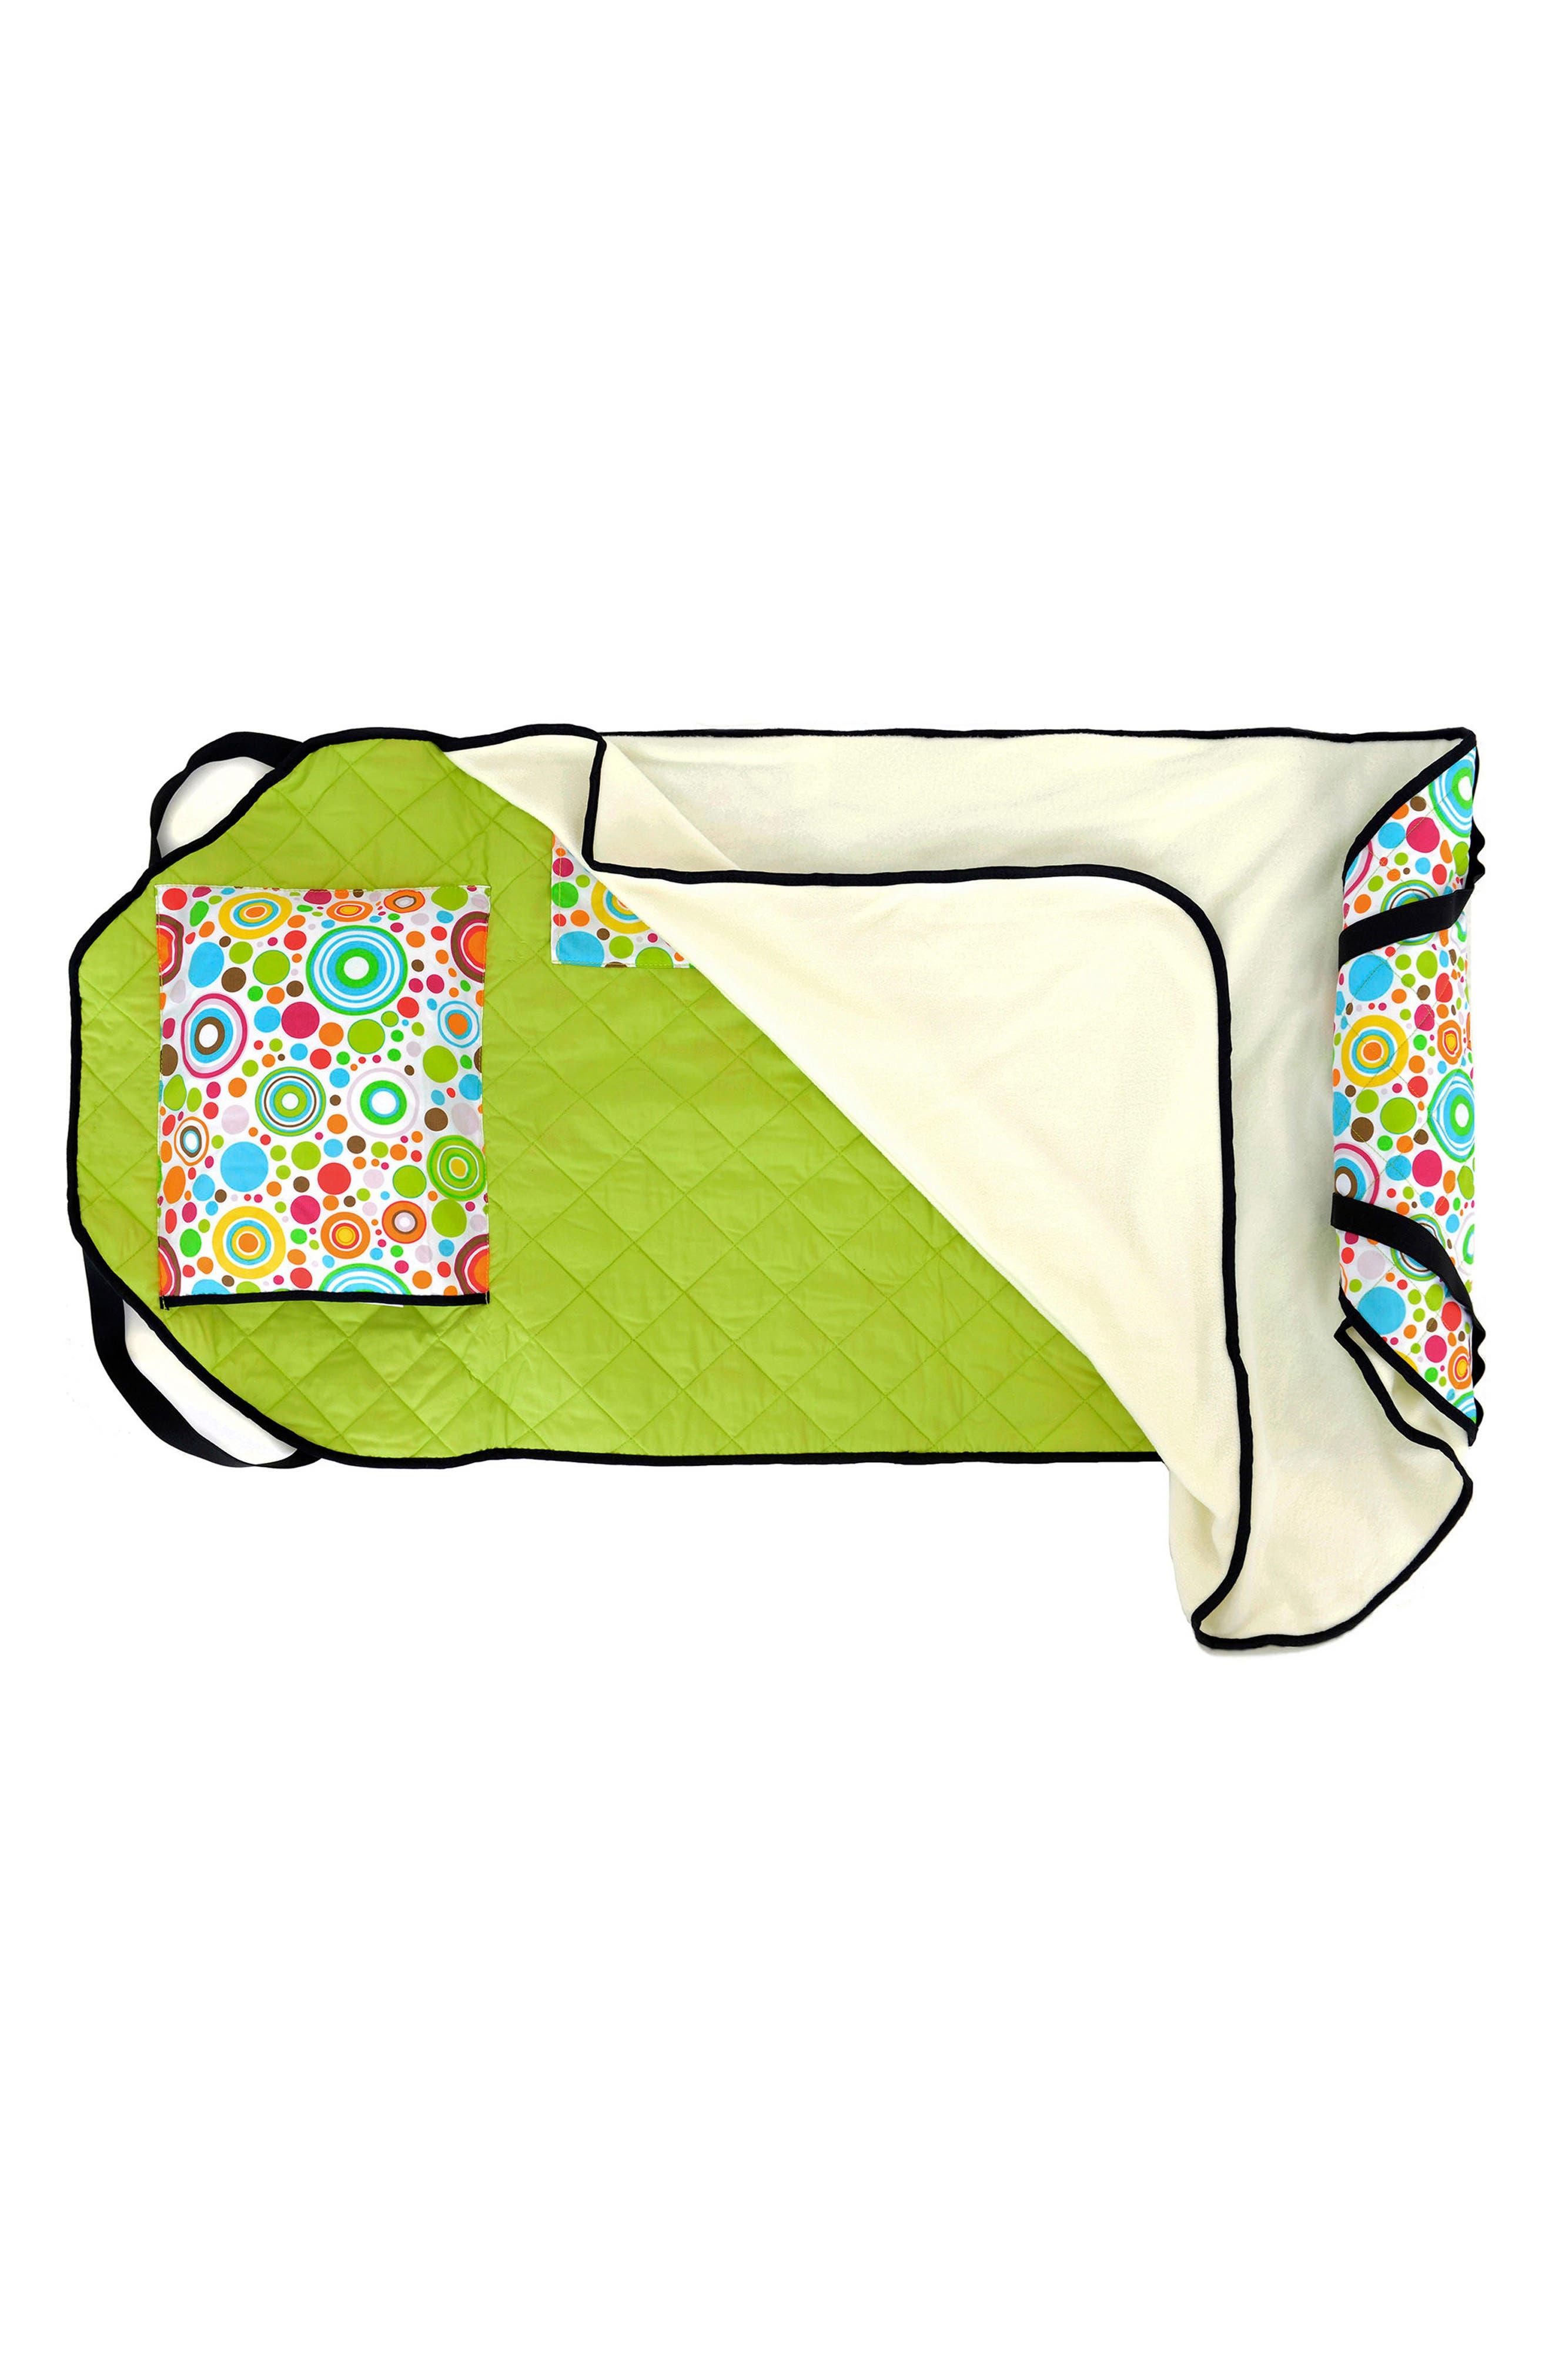 Tot Cot<sup>®</sup> Portable Nap Cot Bedding,                         Main,                         color, 100